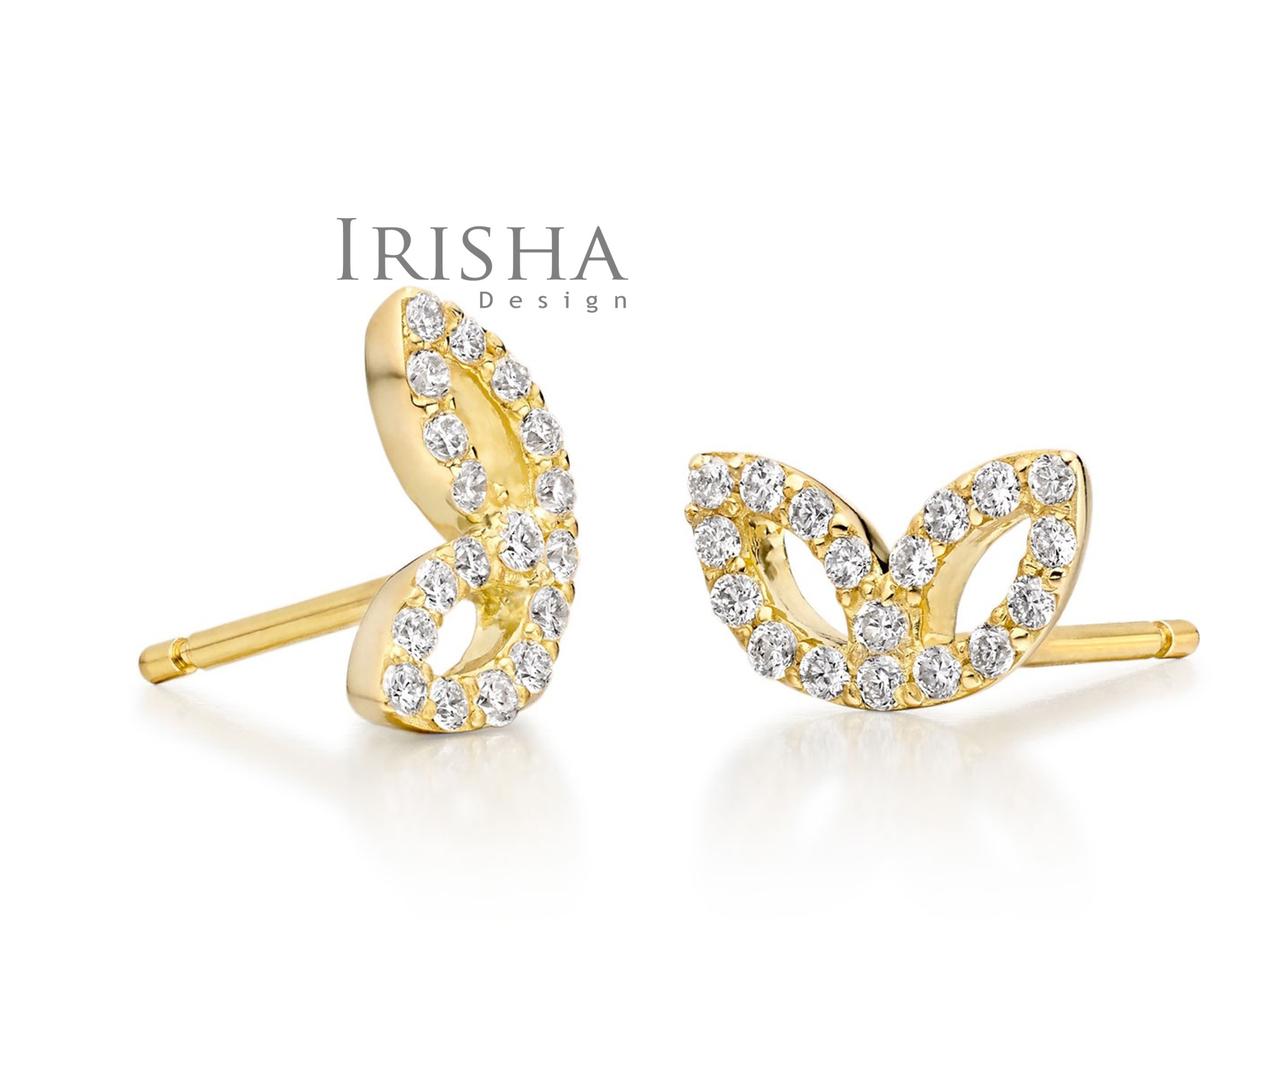 14K Gold 0.24 Ct. Genuine Diamond Beautiful Floral Studs Earrings Fine Jewelry